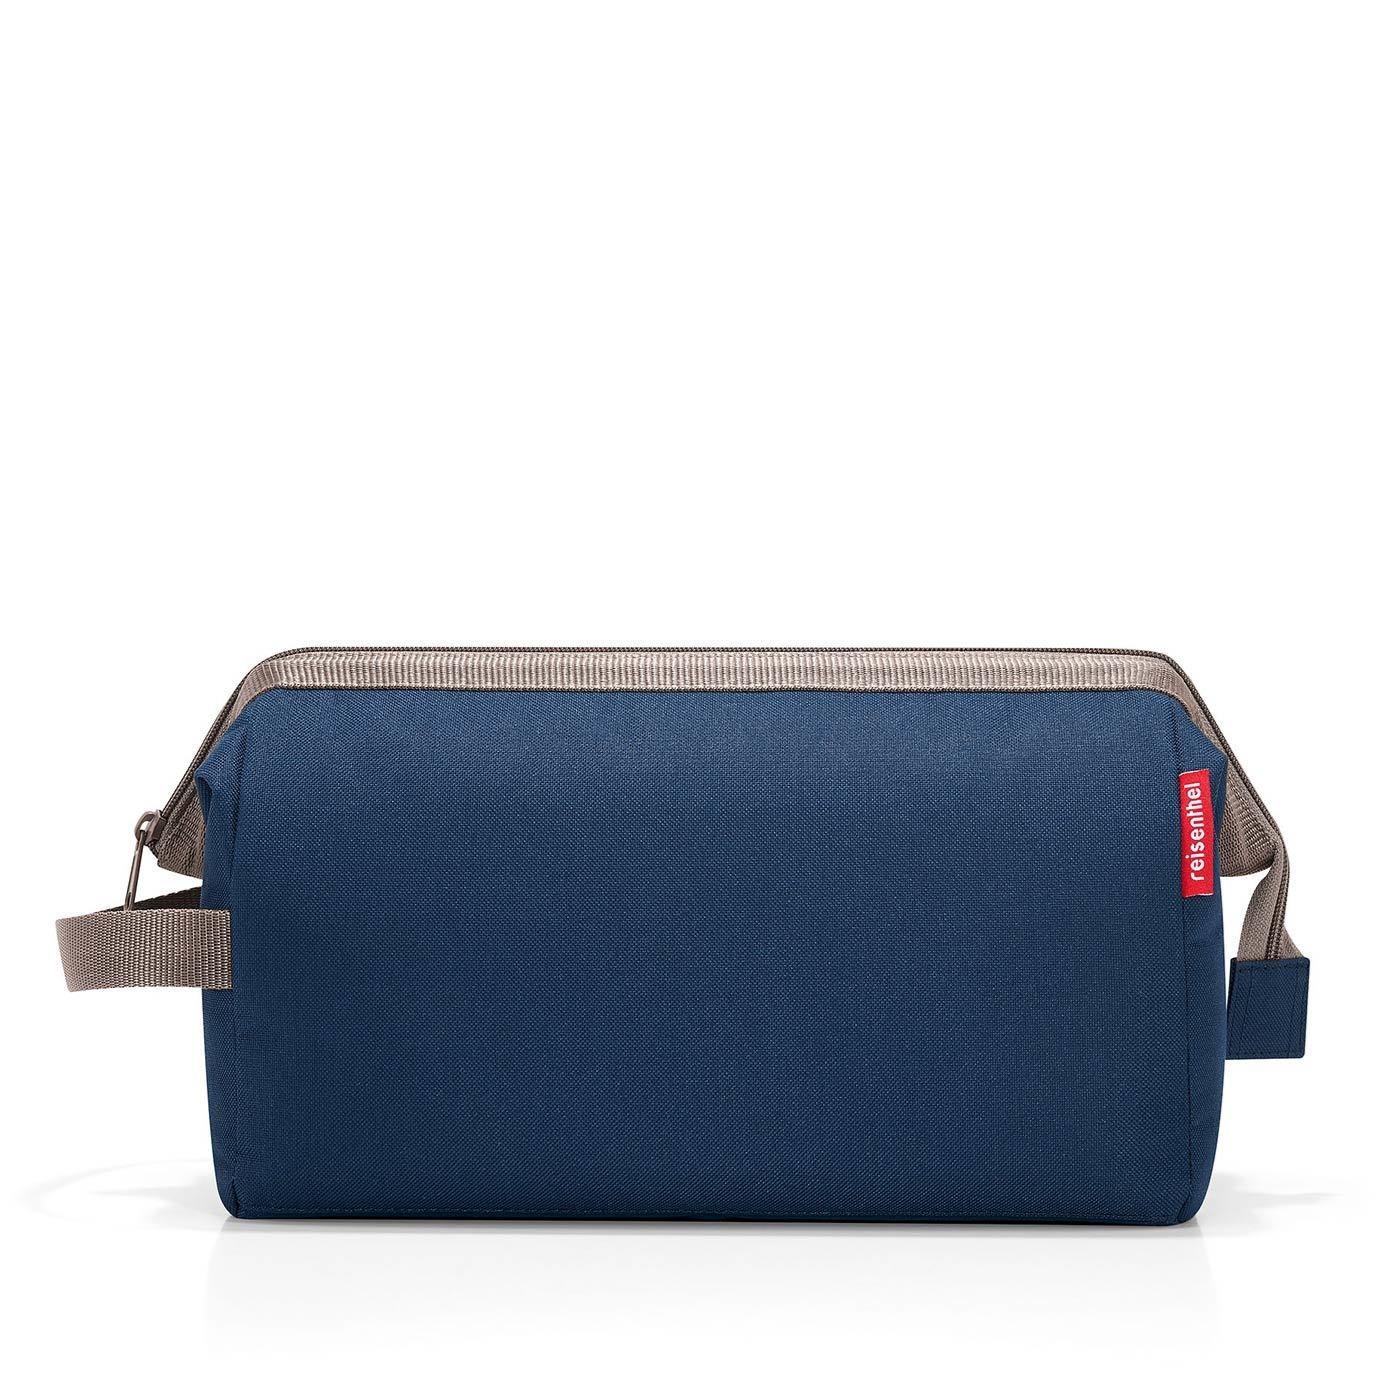 Kosmetická taška TRAVELCOSMETIC XL dark blue_1